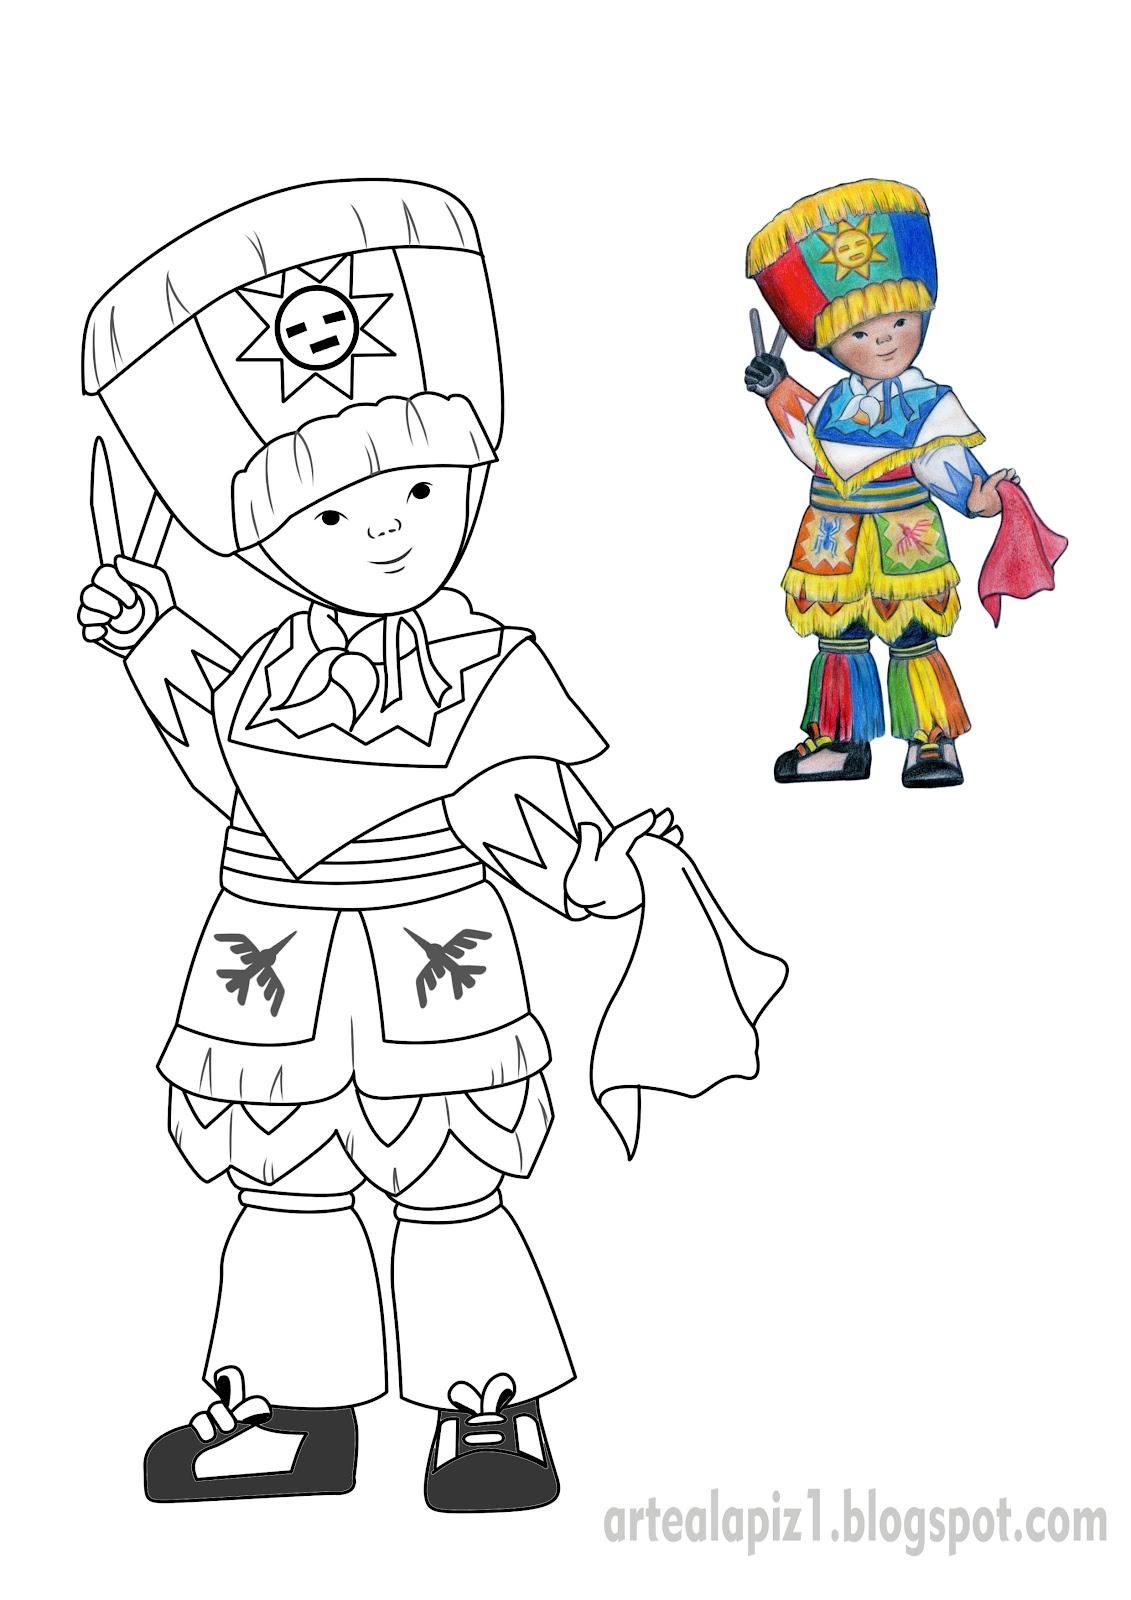 Dibujo a Lápiz: Danza de tijeras